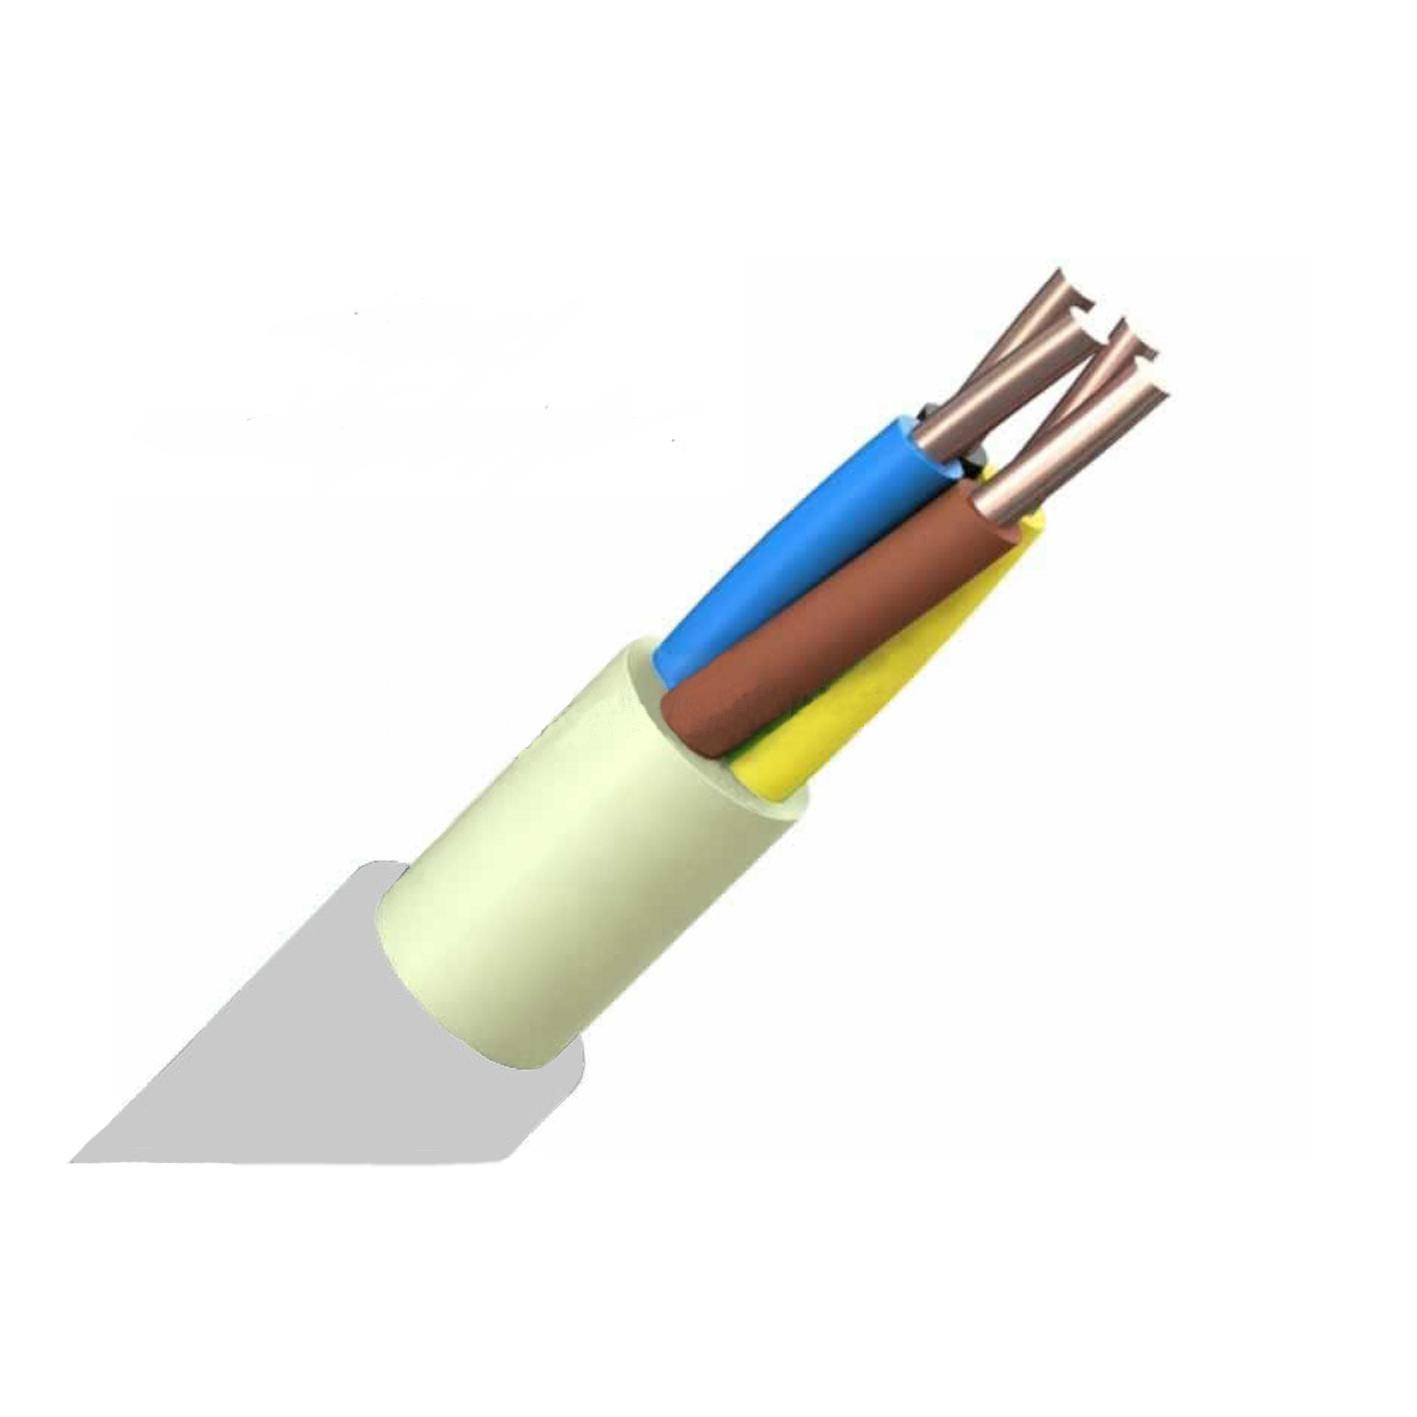 Öznur 4x16 NYM (NVV) Kablo